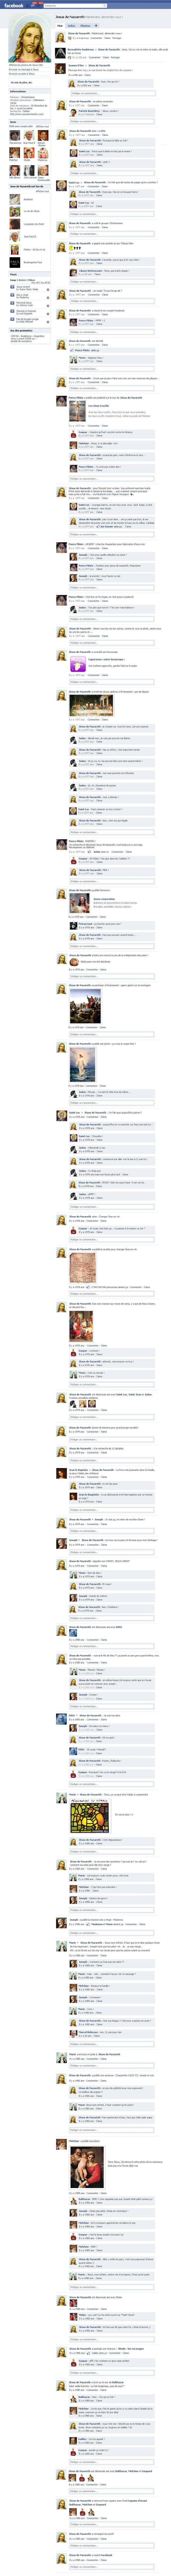 Image Facebook de Jésus